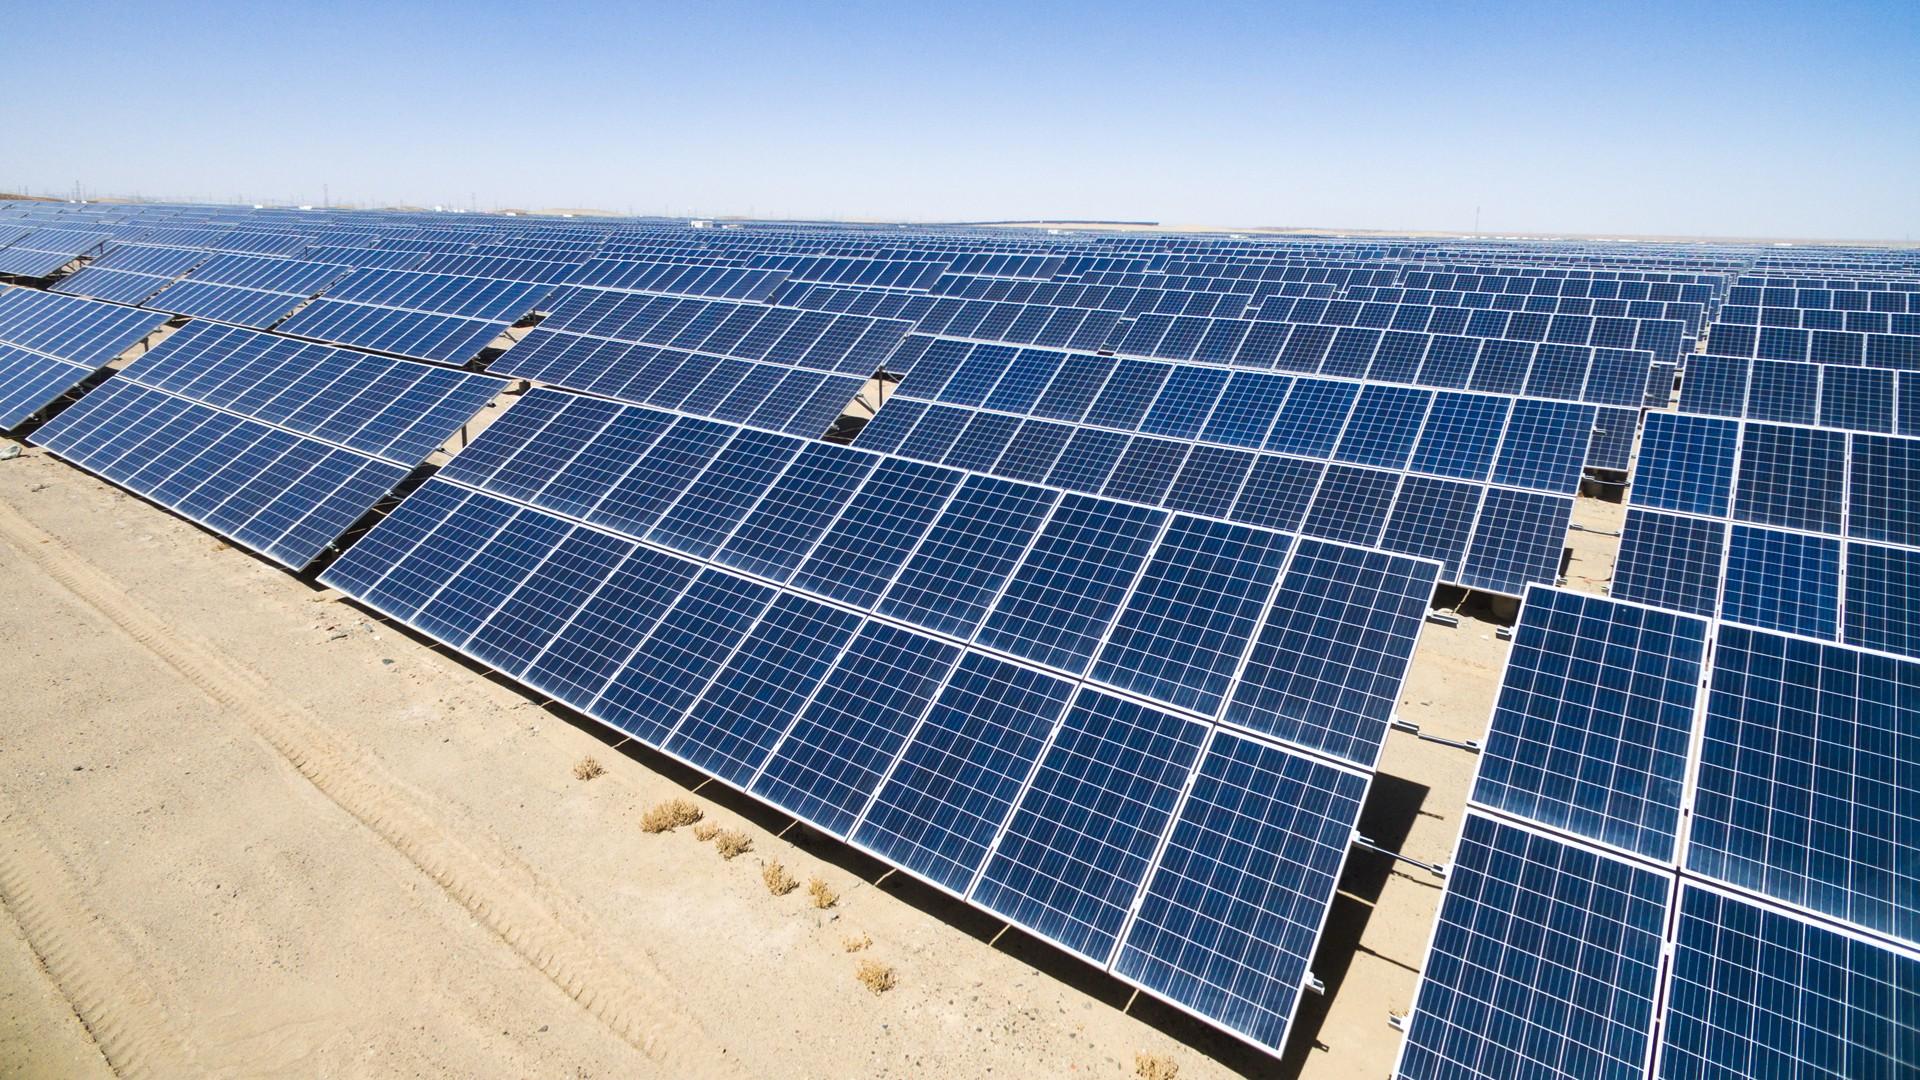 Soluciones energéticas integrales